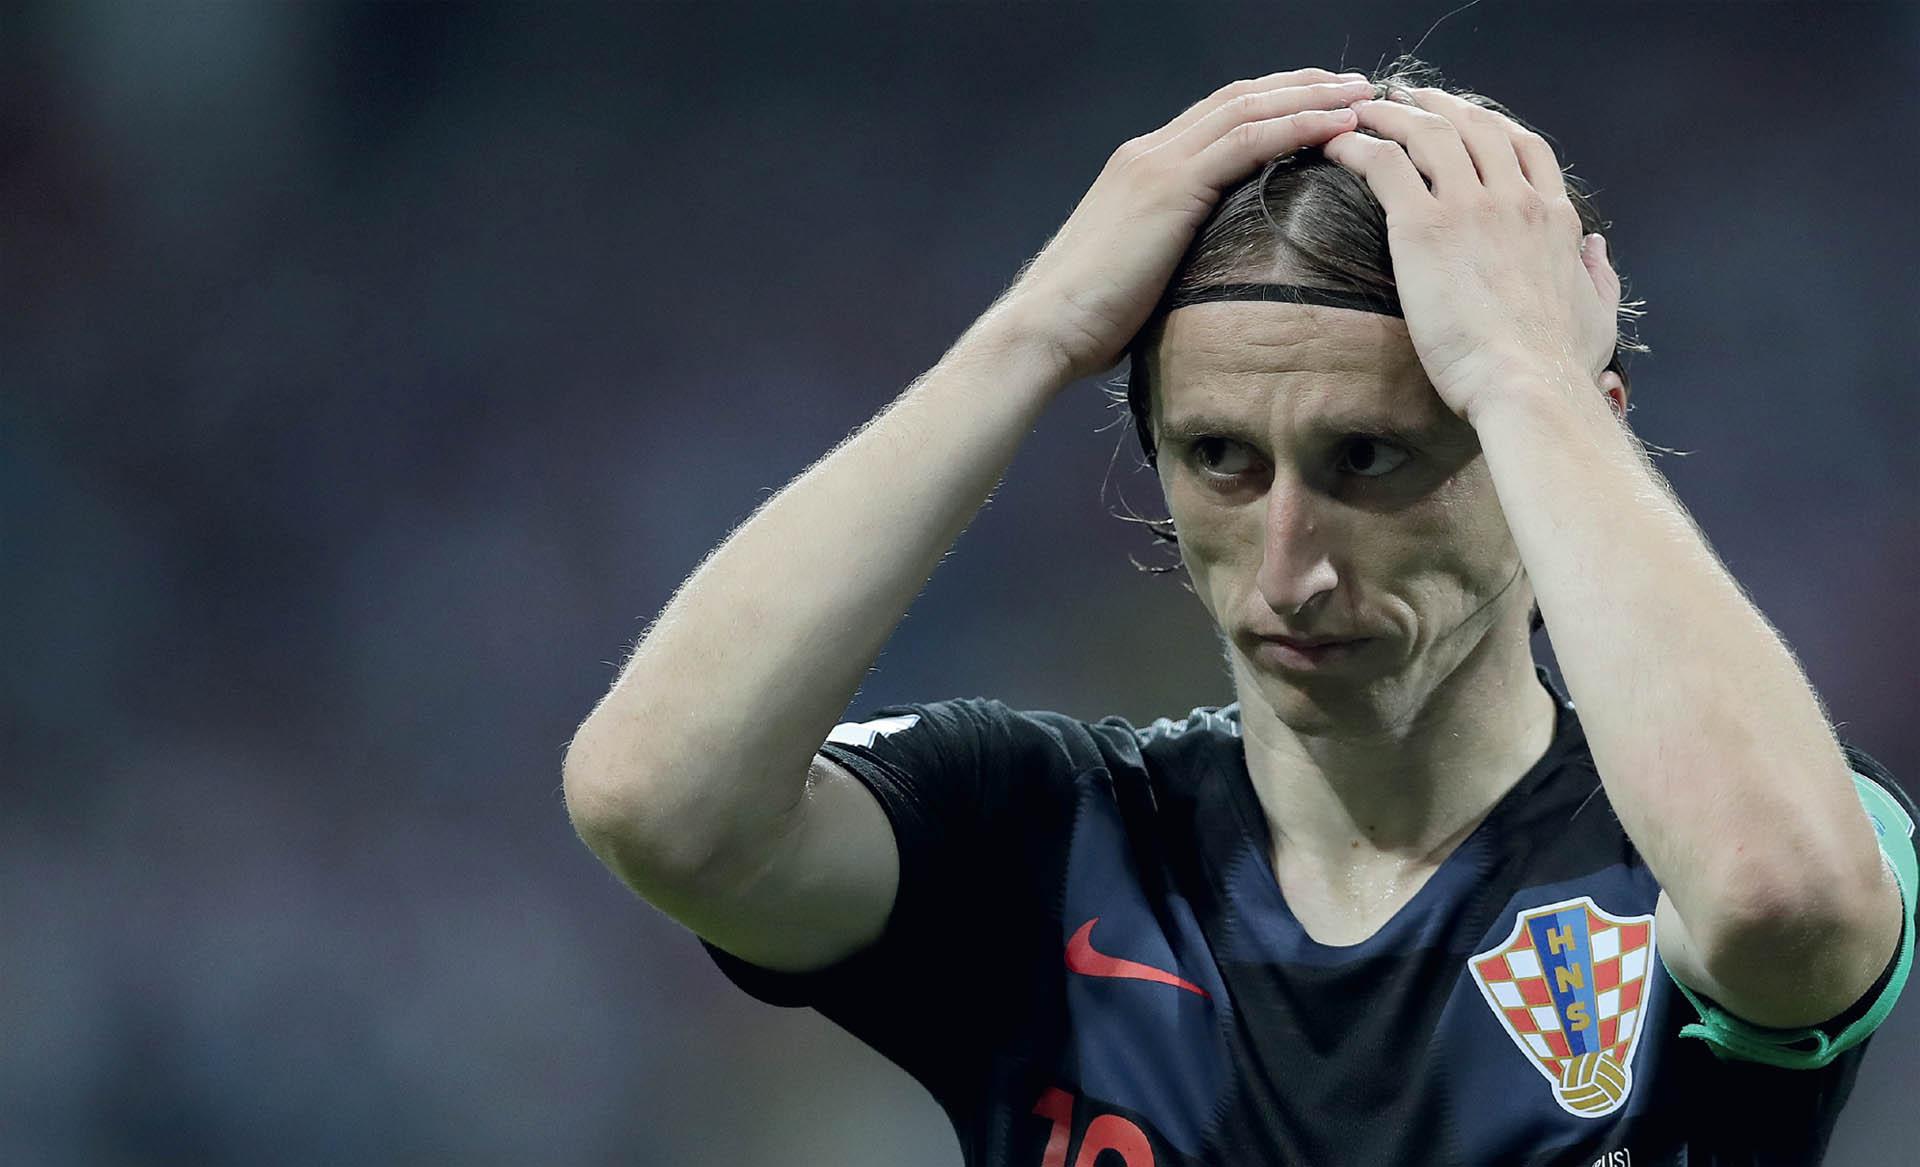 FOOTBALL LEAKS Kako je Luka Modrić donio milijune eura Republici Srpskoj